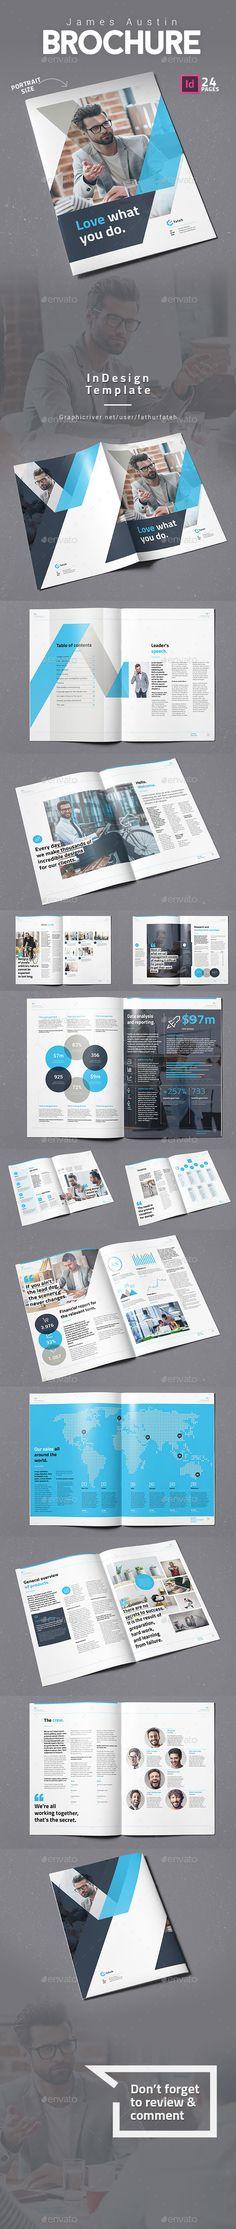 James Austin Brochure Portrait — InDesign Template #flyer #solution • Download ➝ https://graphicriver.net/item/james-austin-brochure-portrait/18486966?ref=pxcr